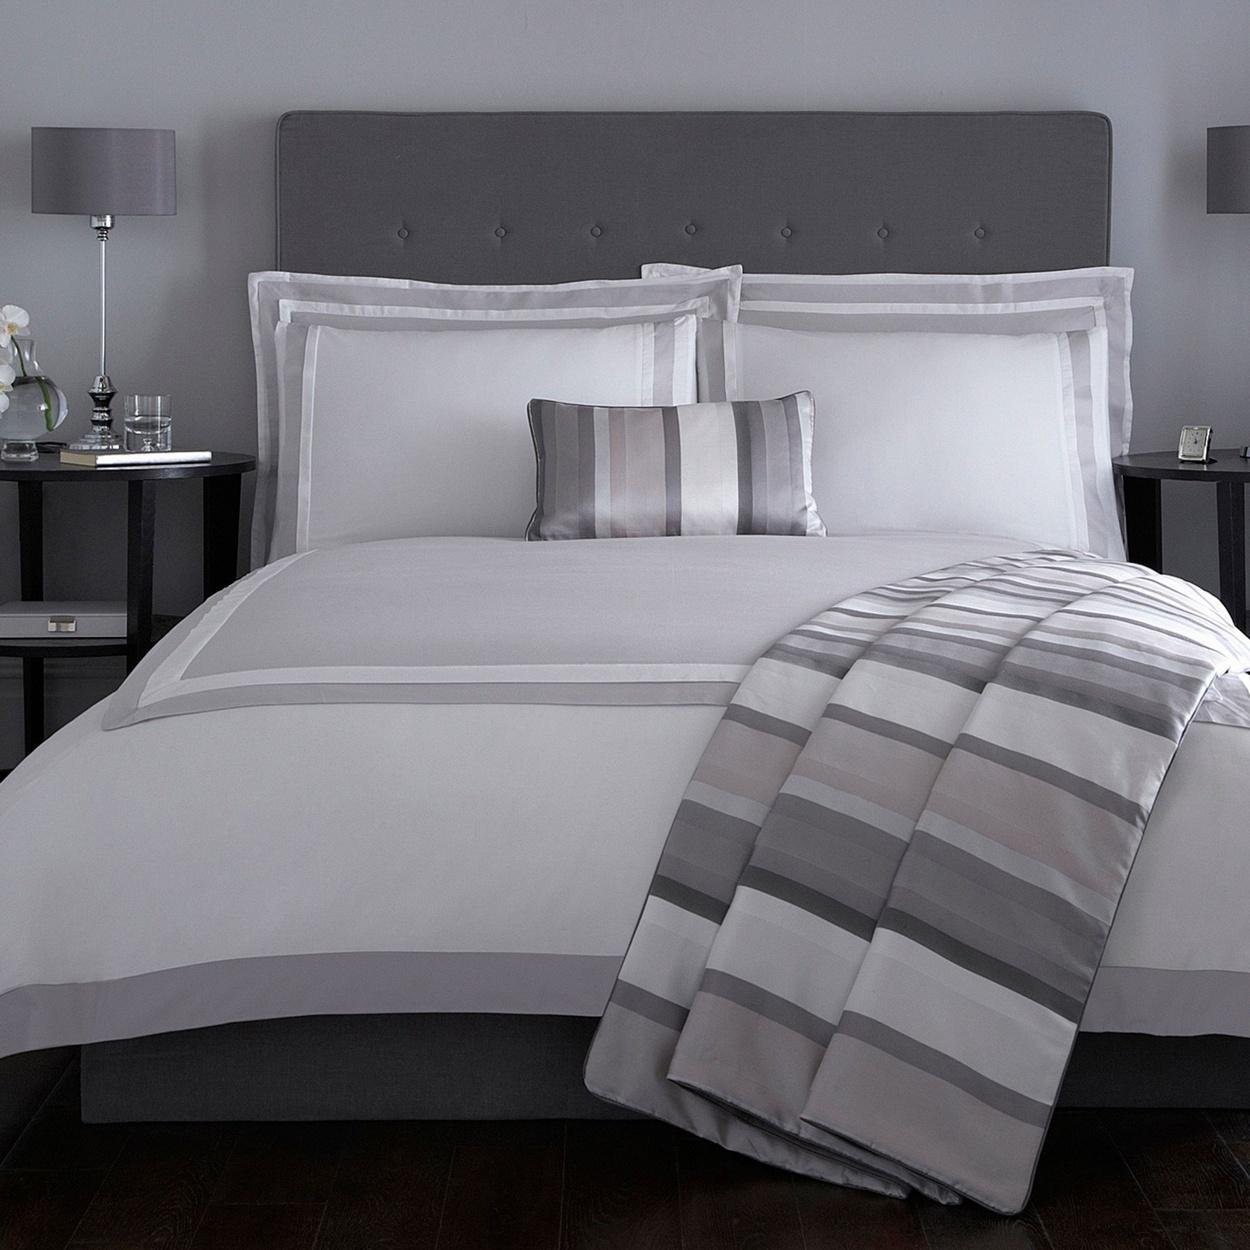 grey and white duvet covers  sweetgalas - j by jasper conran bedding home debenhams